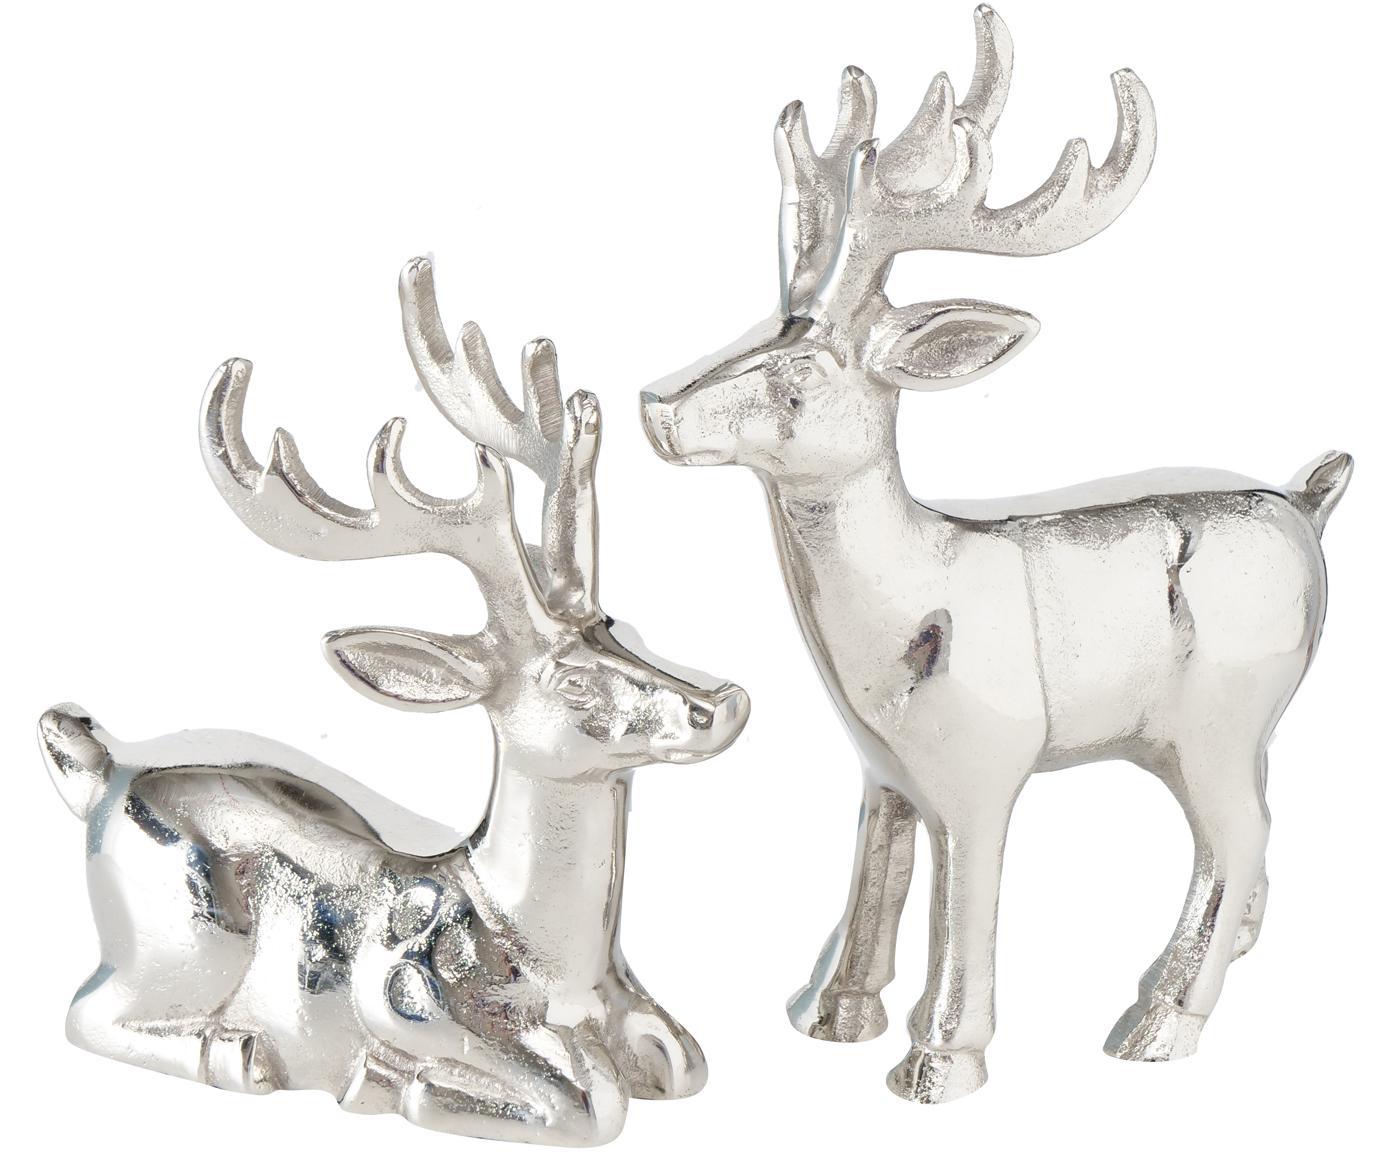 Set de figuras decorativas Tuxel, 2pzas., Aluminio niquelado, Níquel, Set de diferentes tamaños